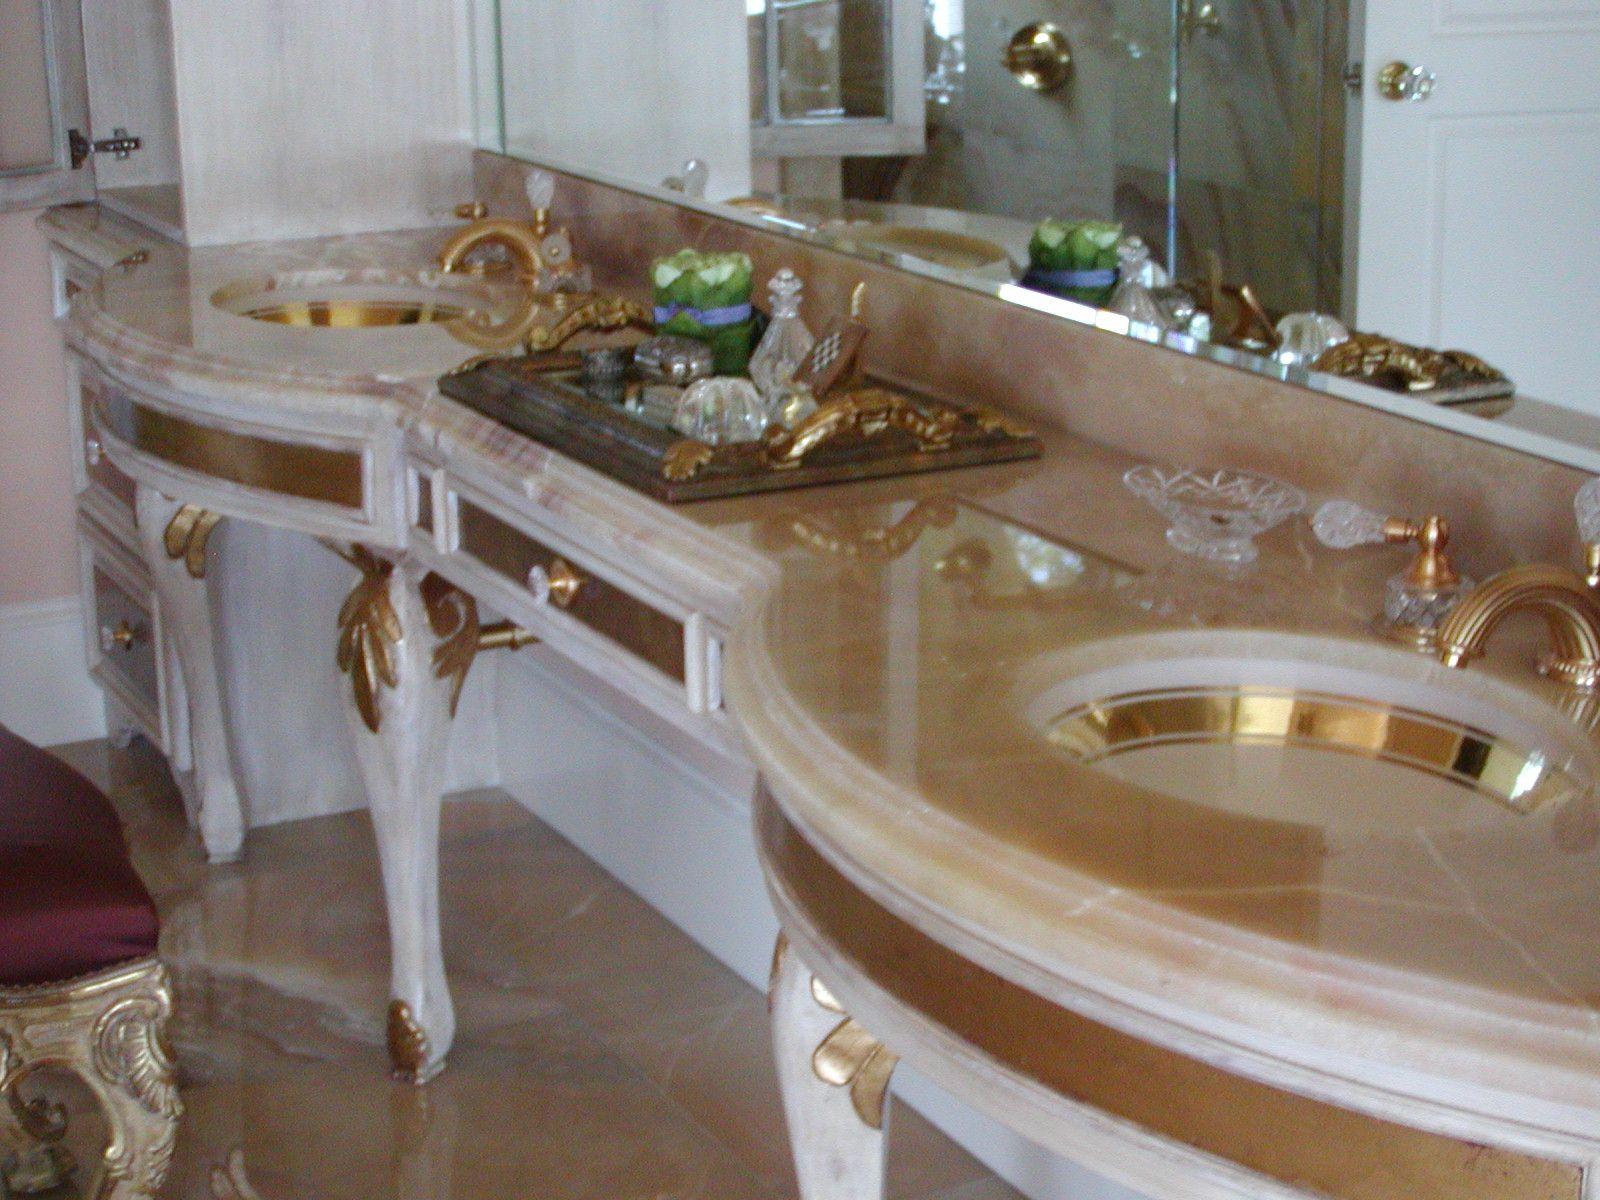 Rounded Tan / White Granite bathroom countertop / Vanity, White